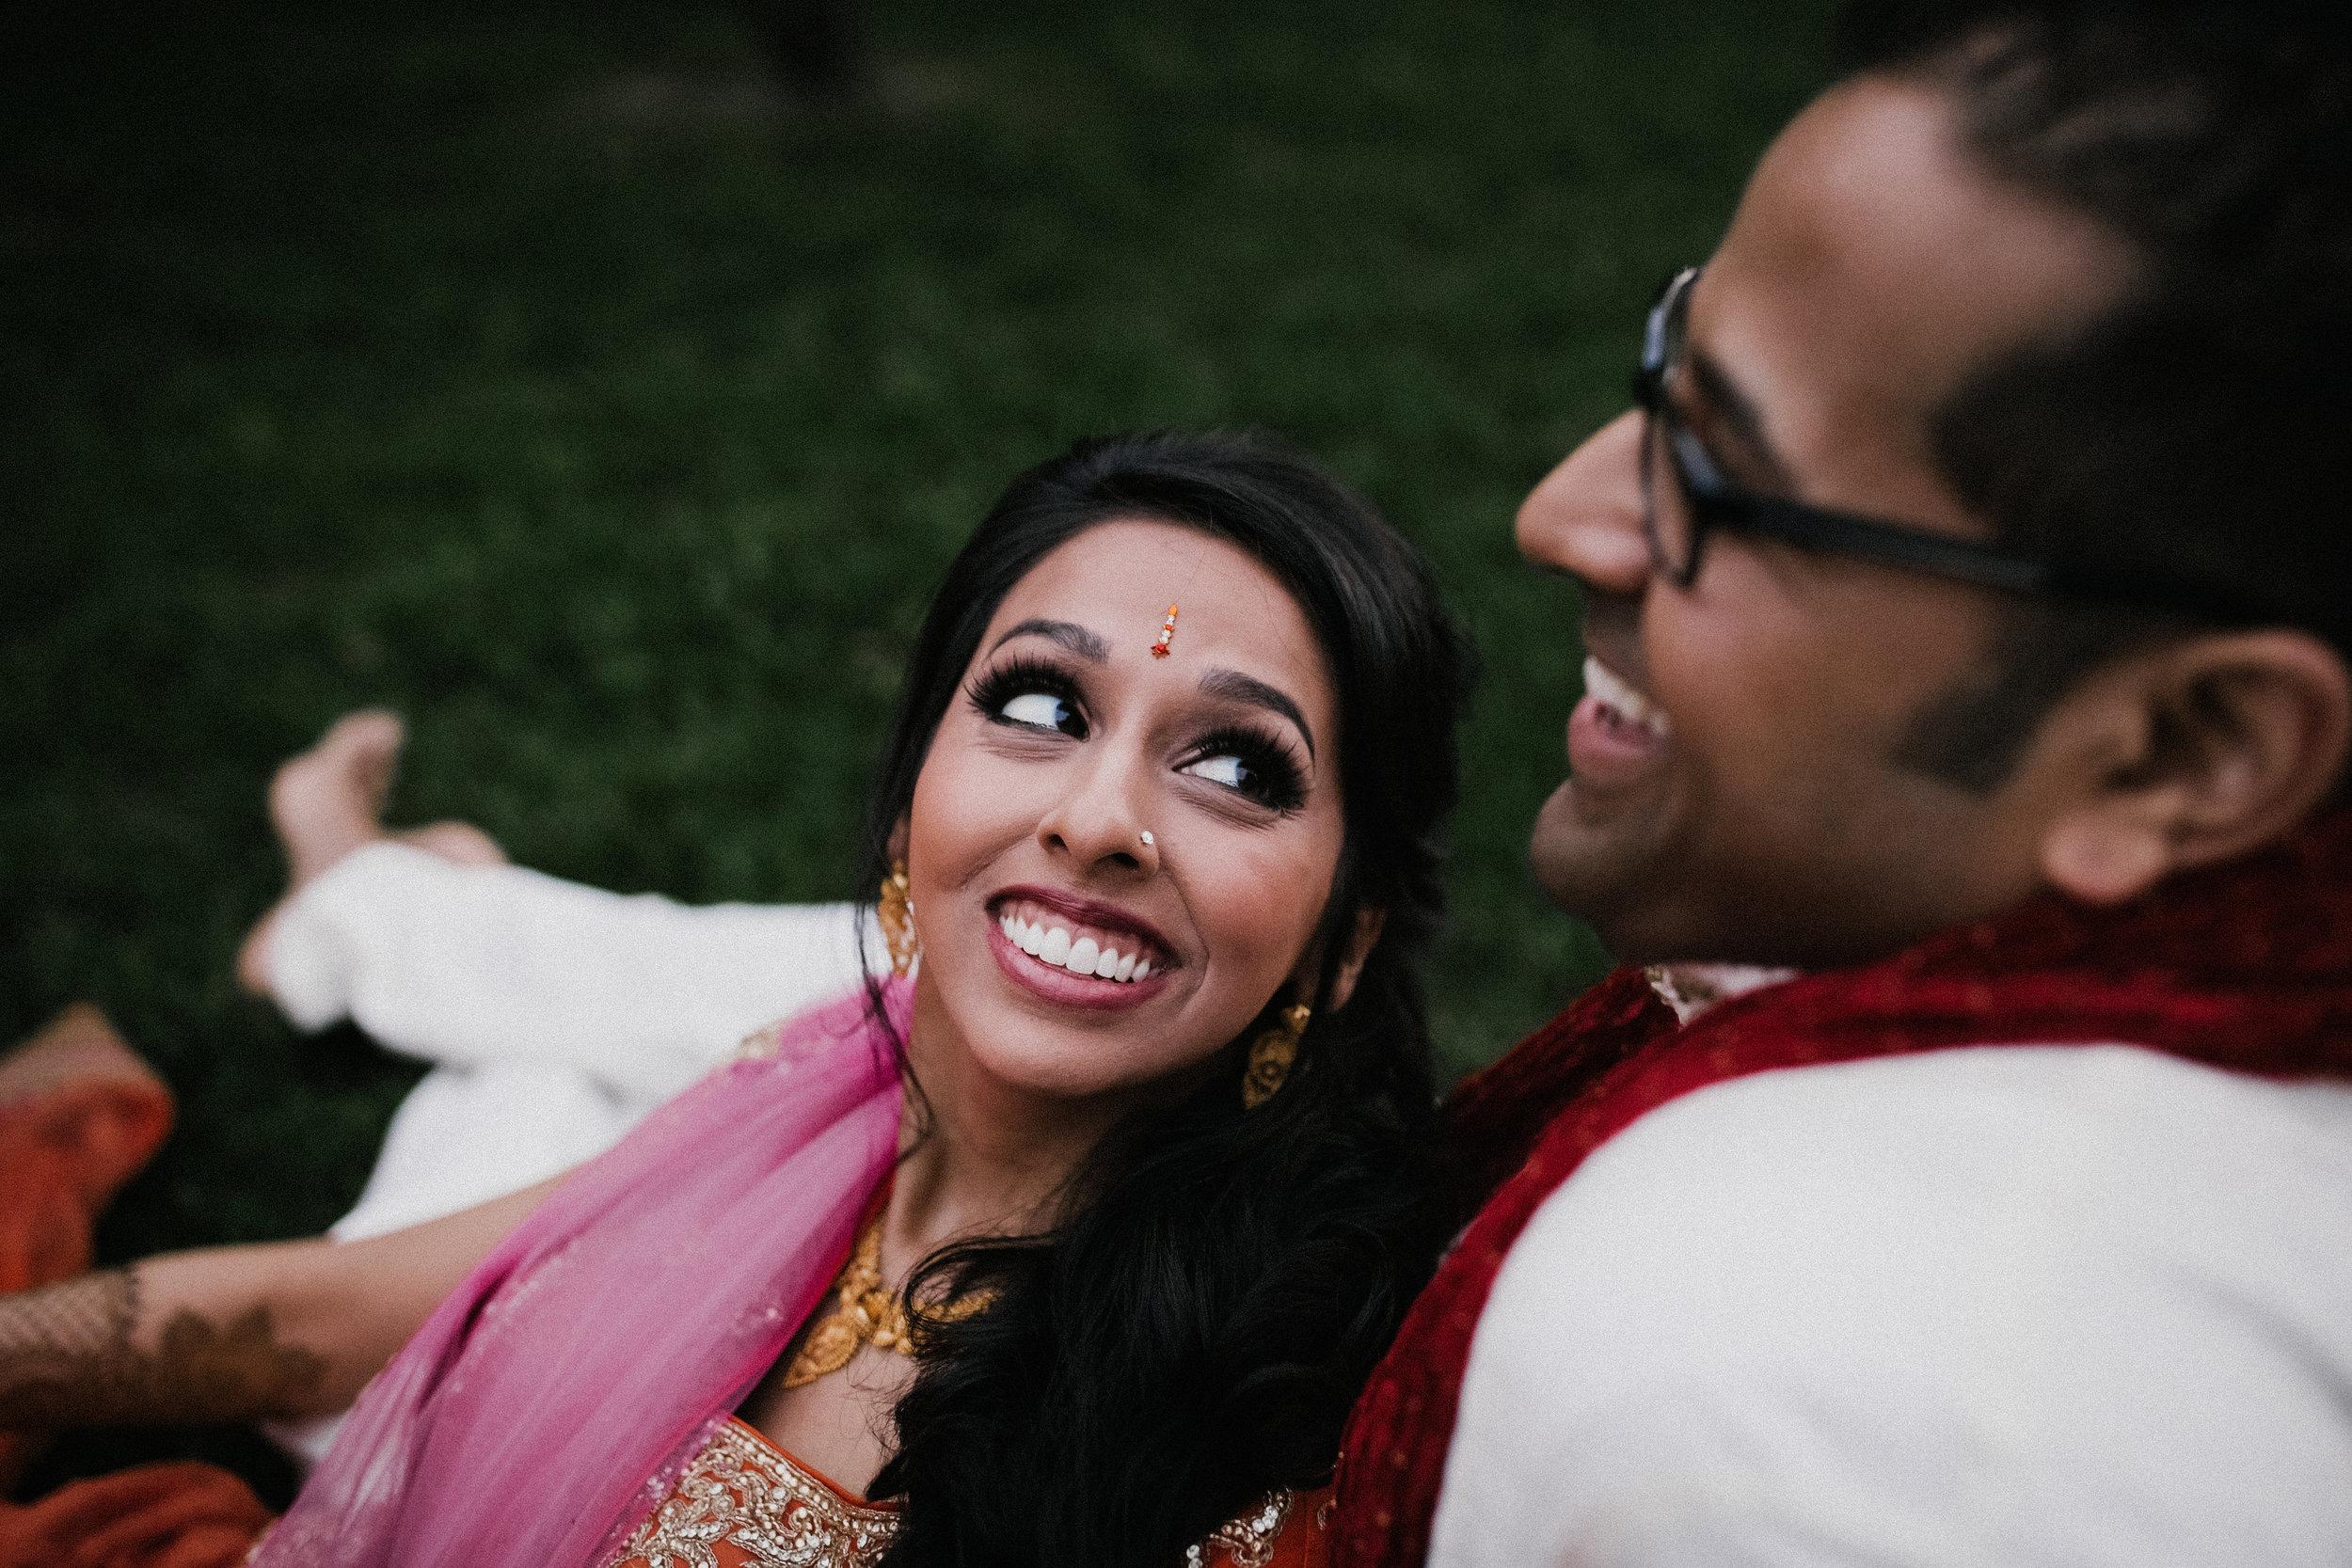 Aparna-Ankit-Patel-Mehndi-Wedding-Photos-0090.jpg